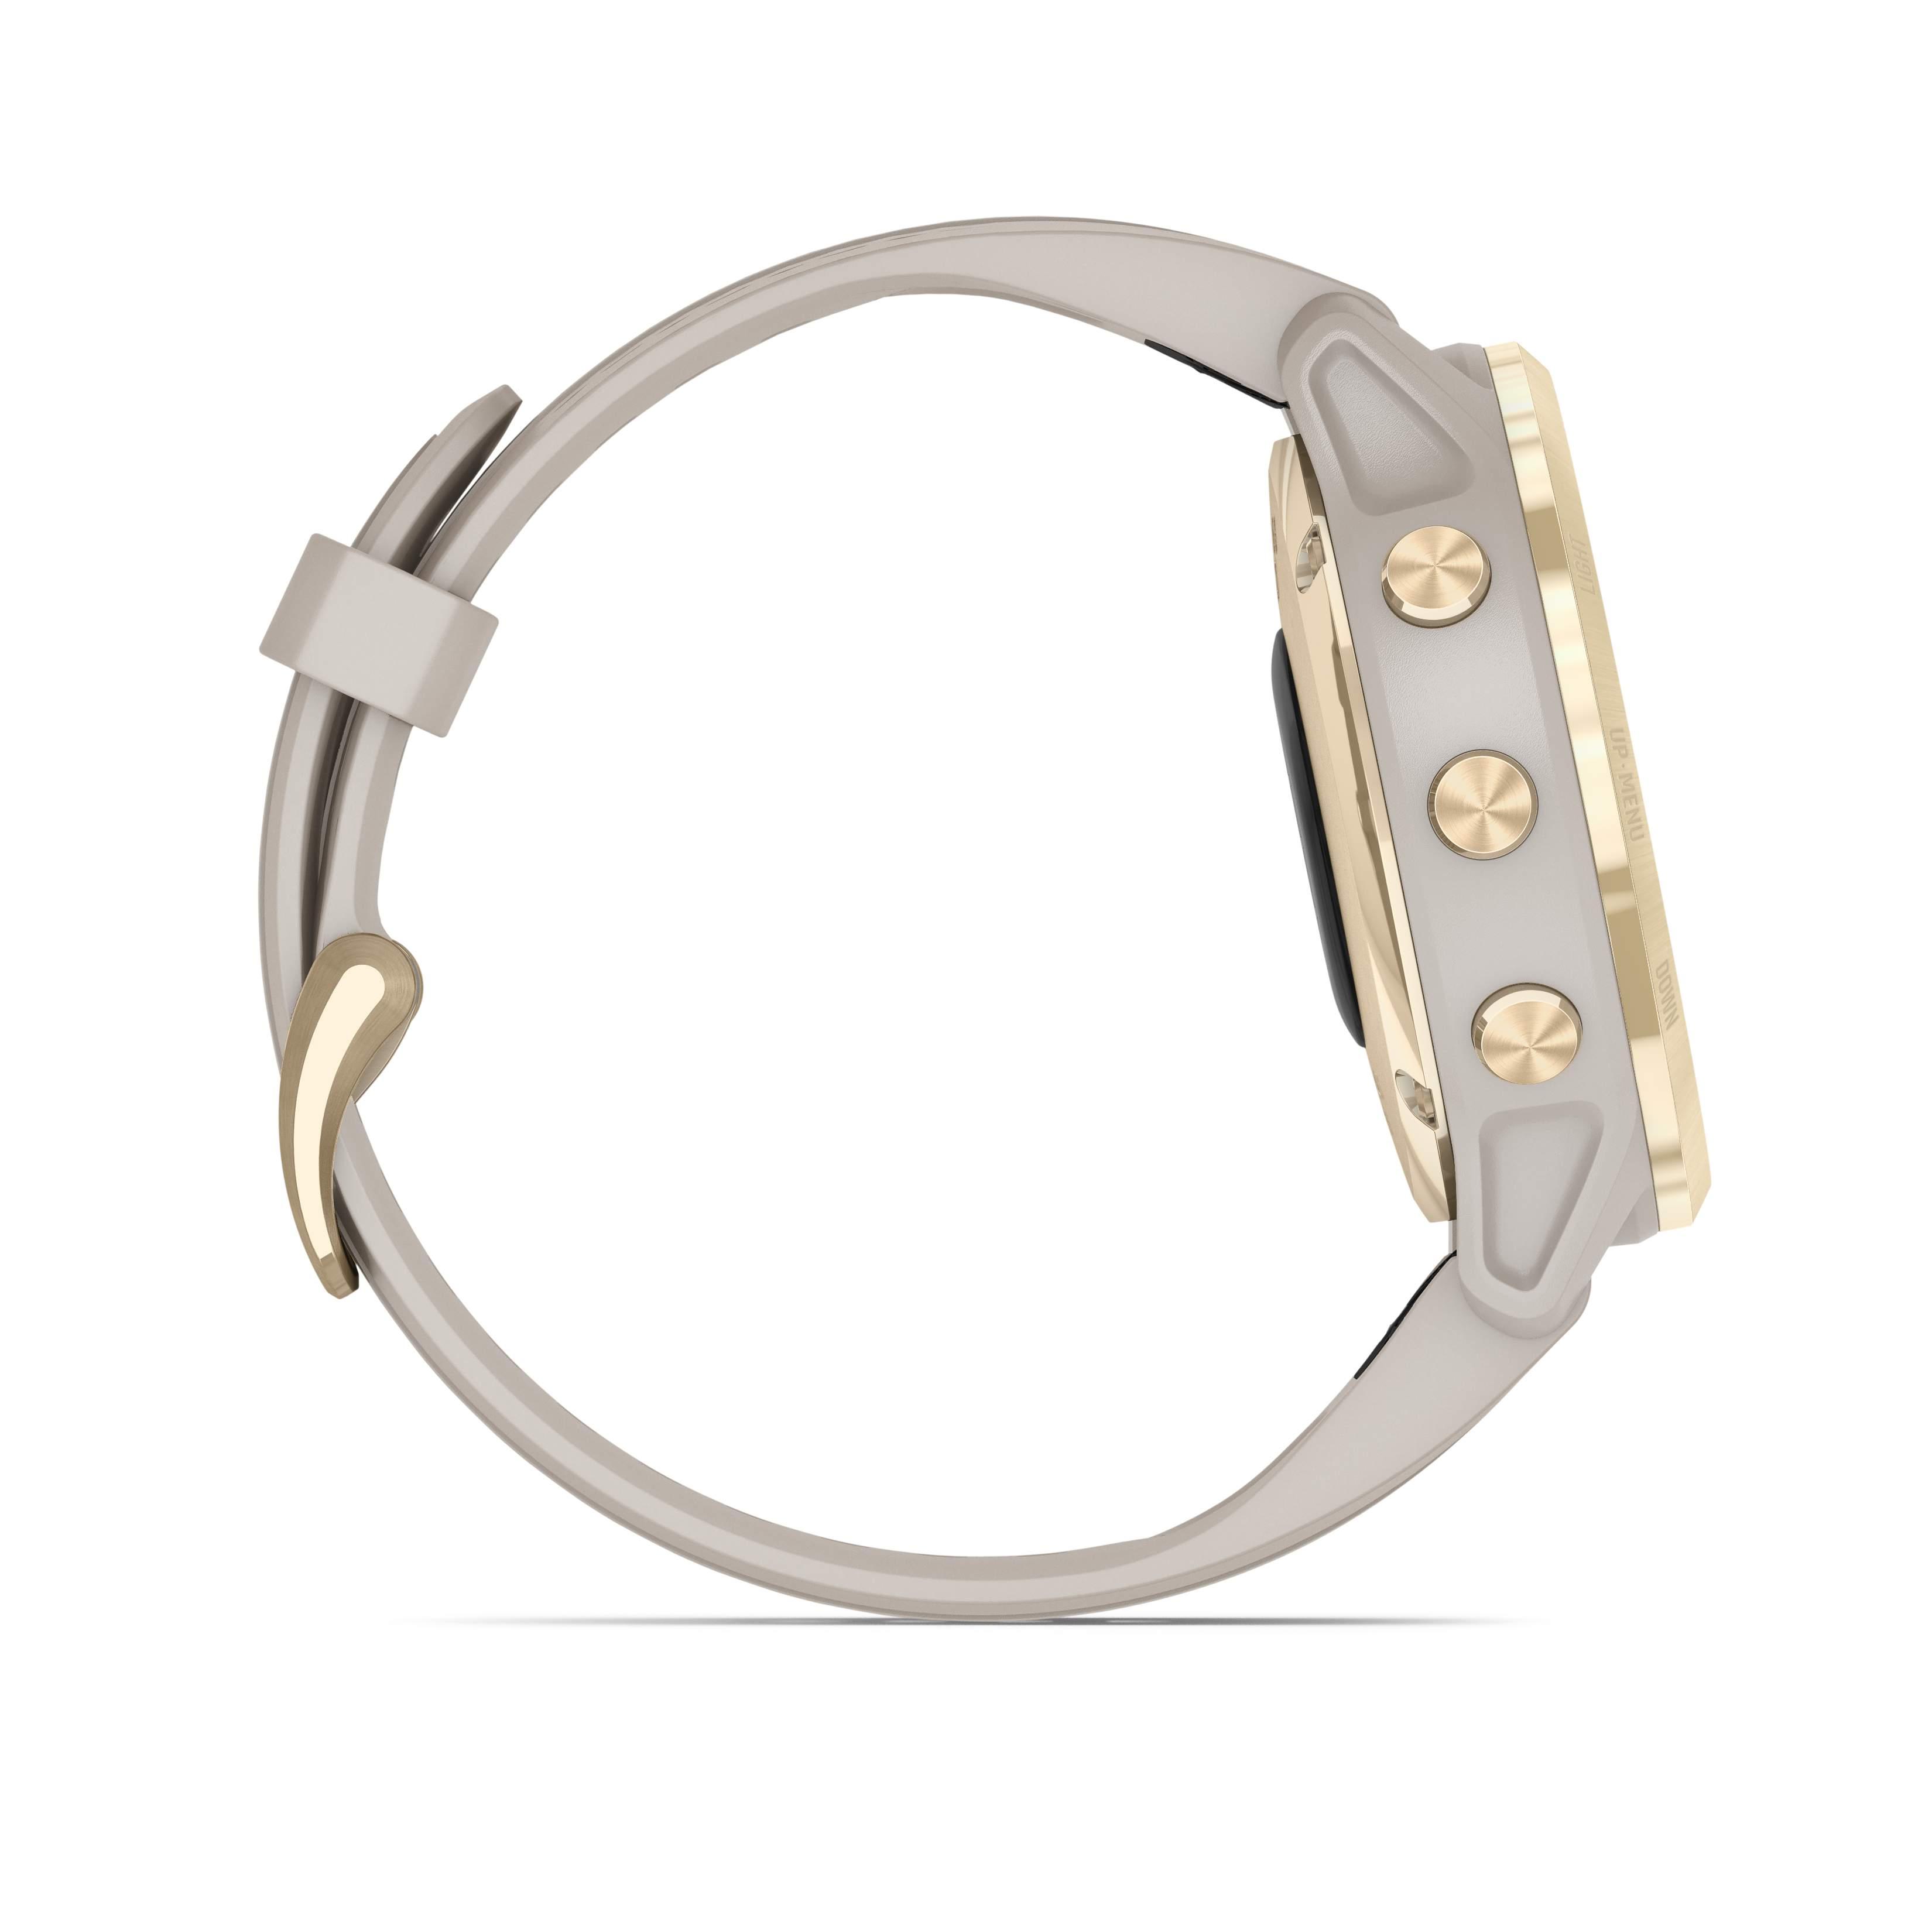 Garmin fēnix® 6S – Pro Solar, Weißgold mit beigefarbenem Armband